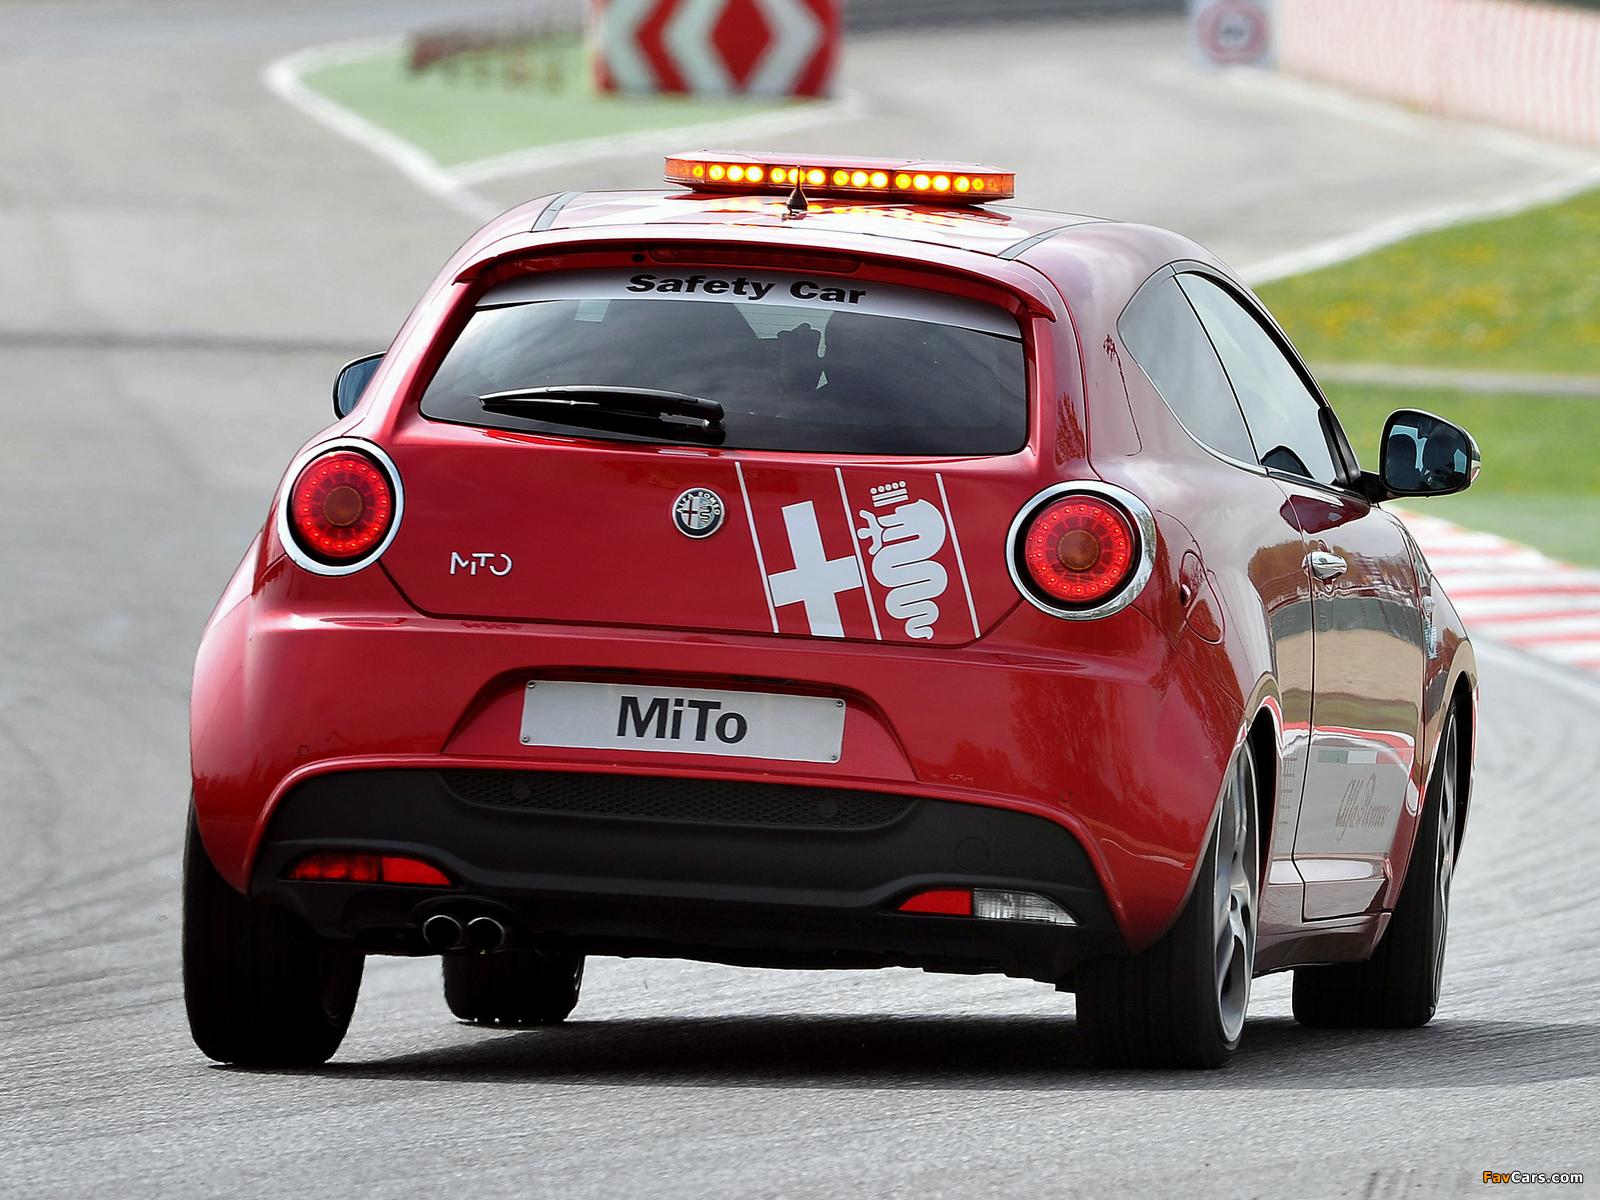 Alfa Romeo Mito >> Alfa Romeo MiTo Quadrifoglio Verde SBK Safety Car 955 (2011) photos (1600x1200)